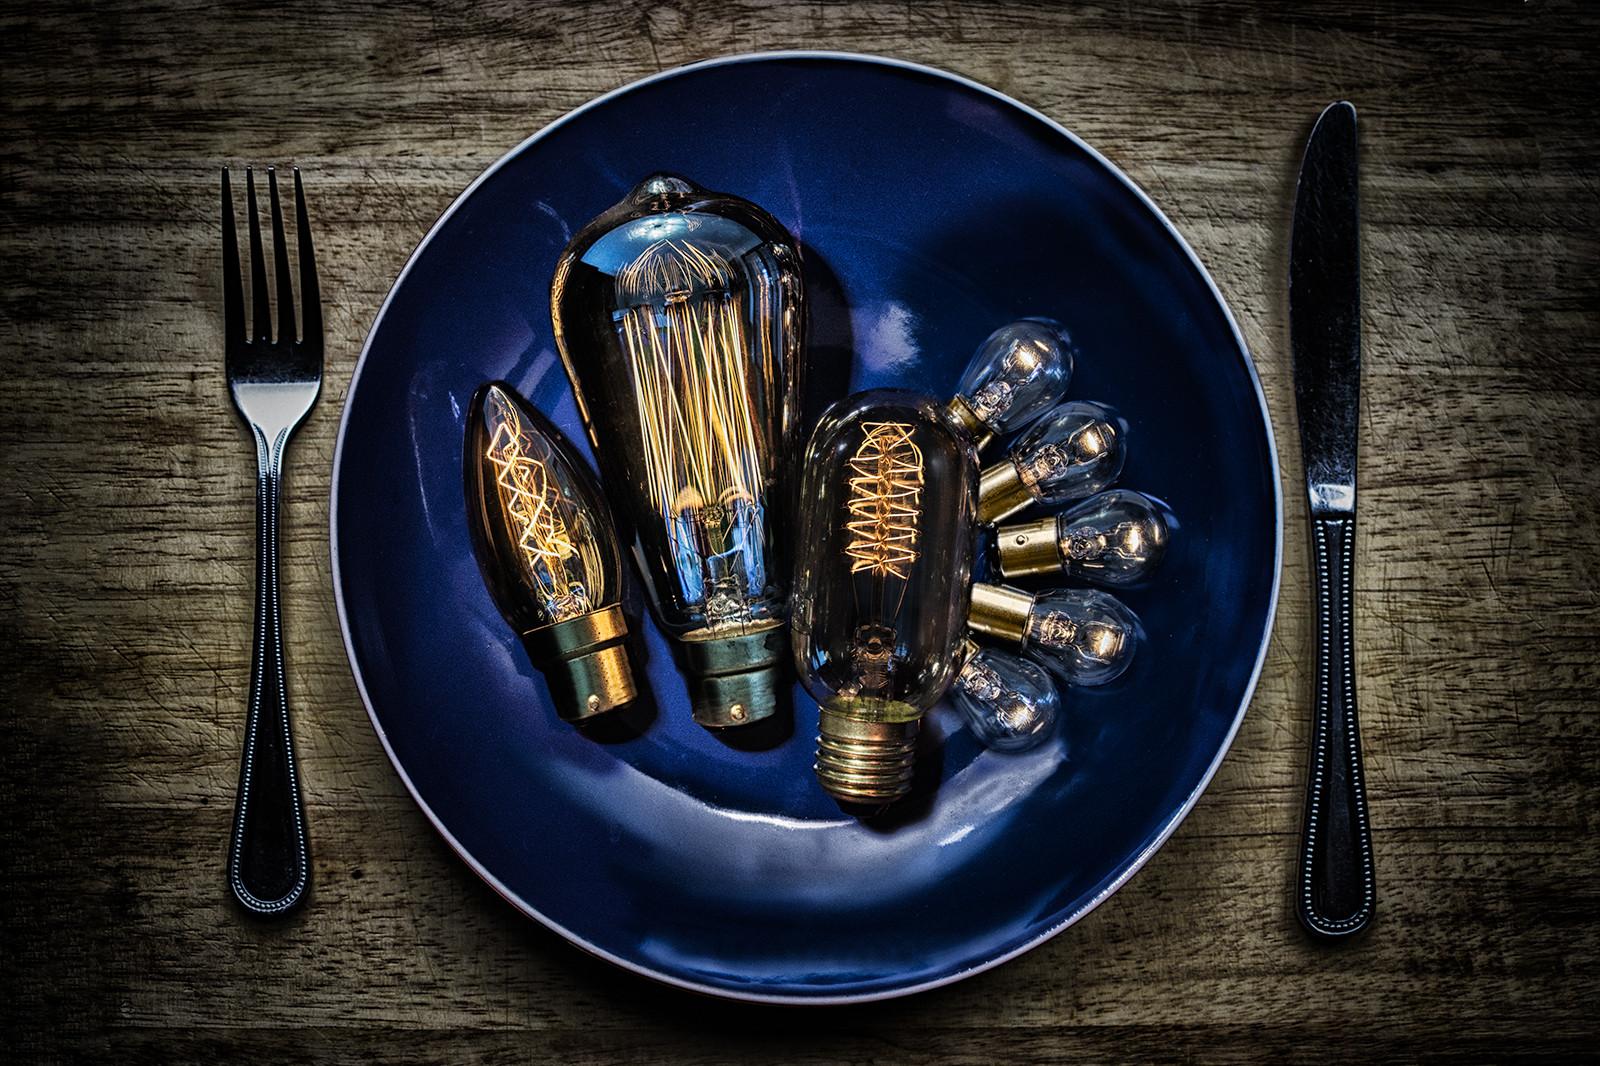 COLOUR - A Light Lunch by Steve Stewart (9 marks)